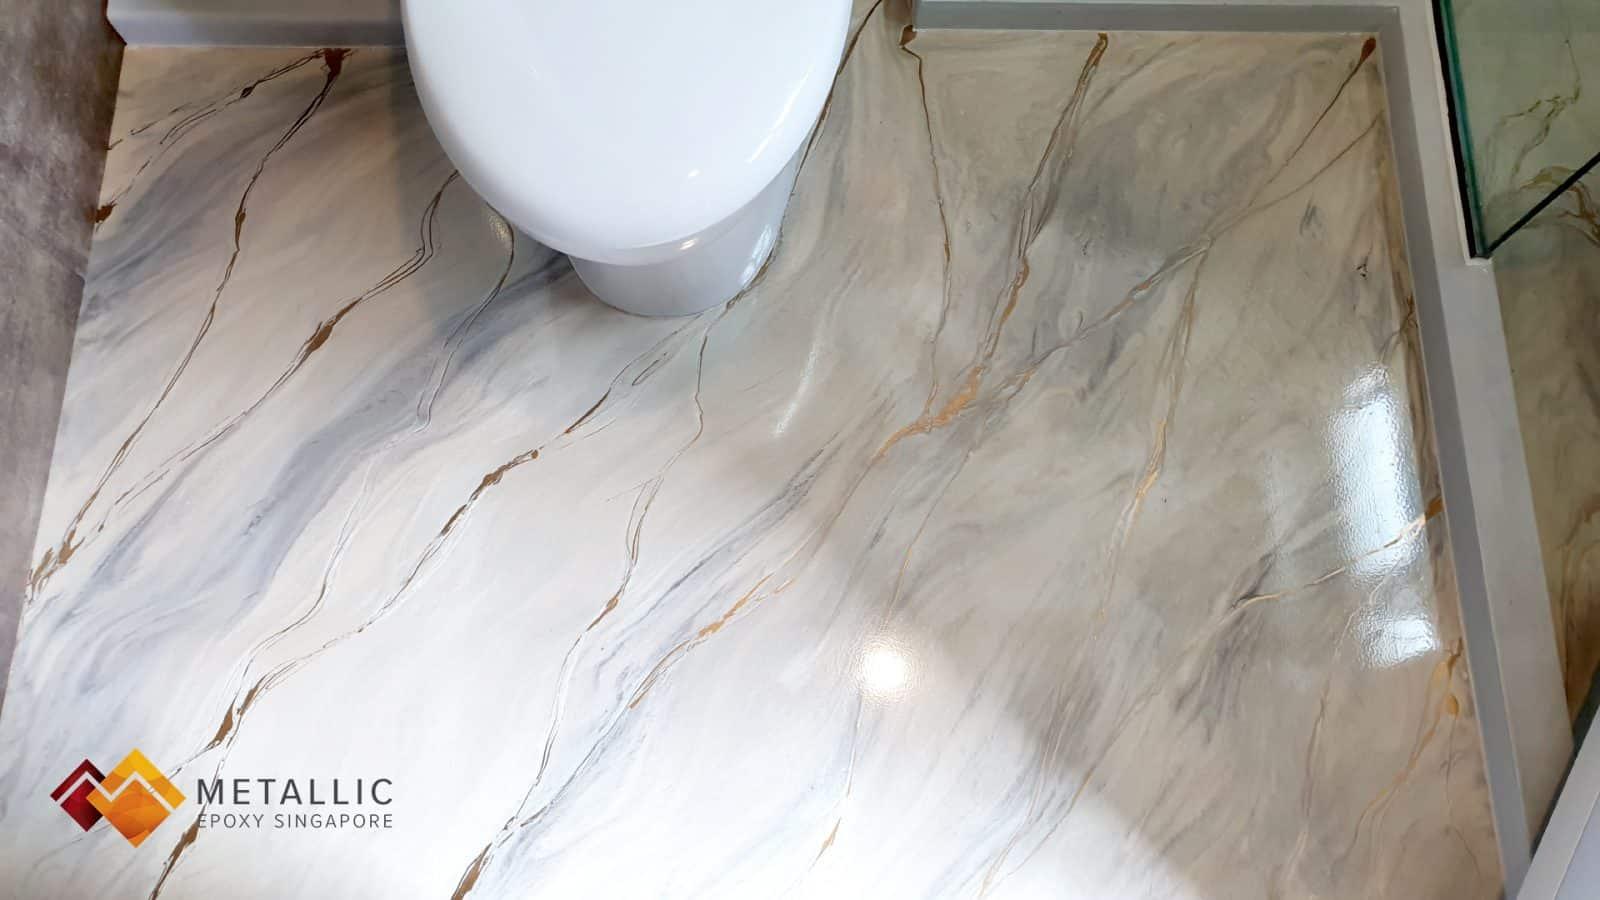 metallic epoxy singapore coffee gold brown marble bathroom floor